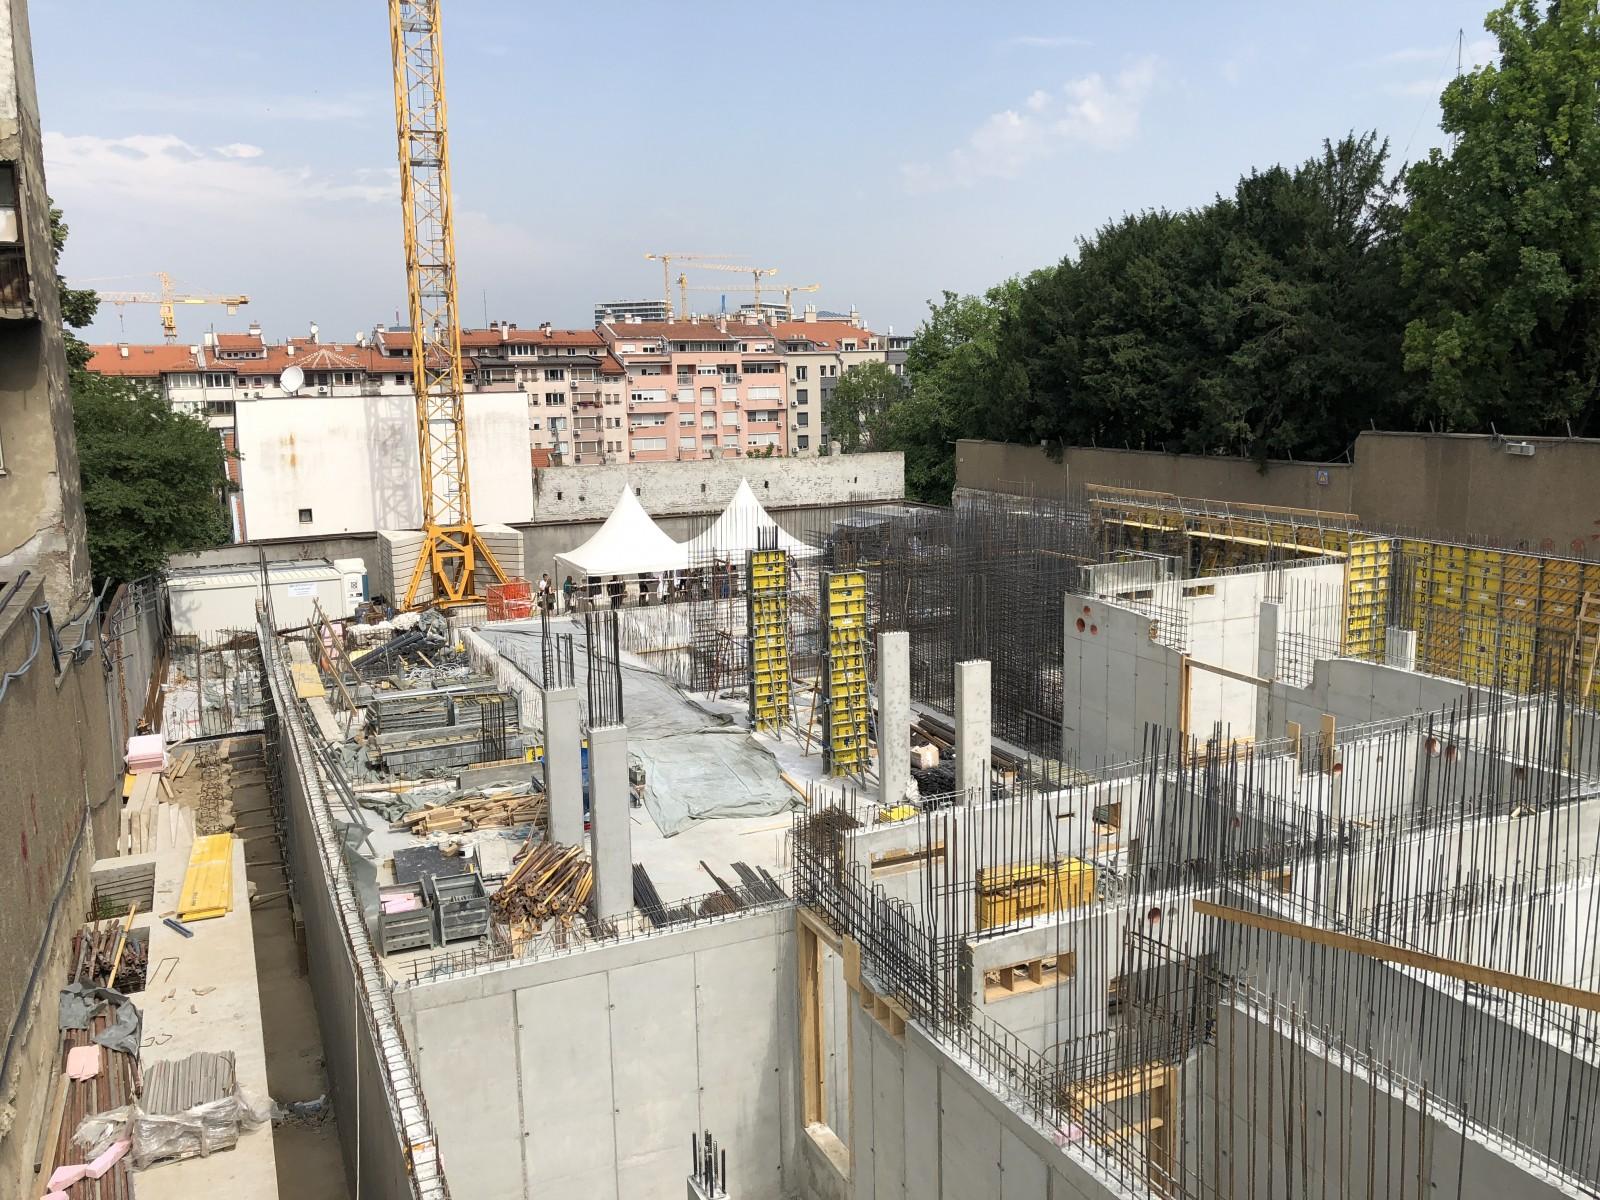 Baustelle Neubau Deutsche Botschaft Belgrad